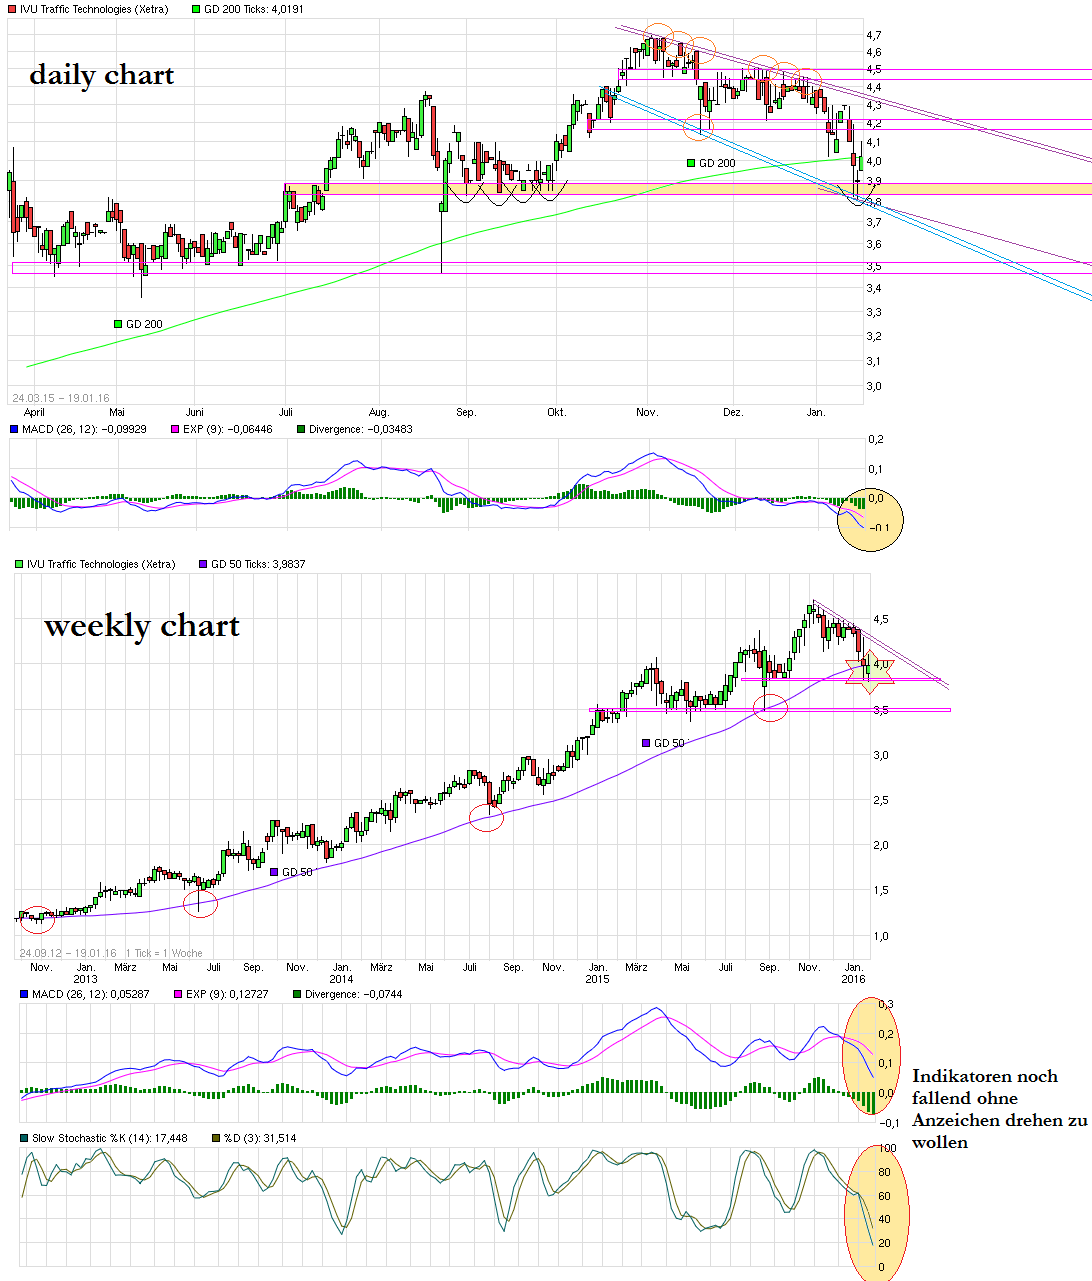 chart_free__ivutraffictechnologies--m.png